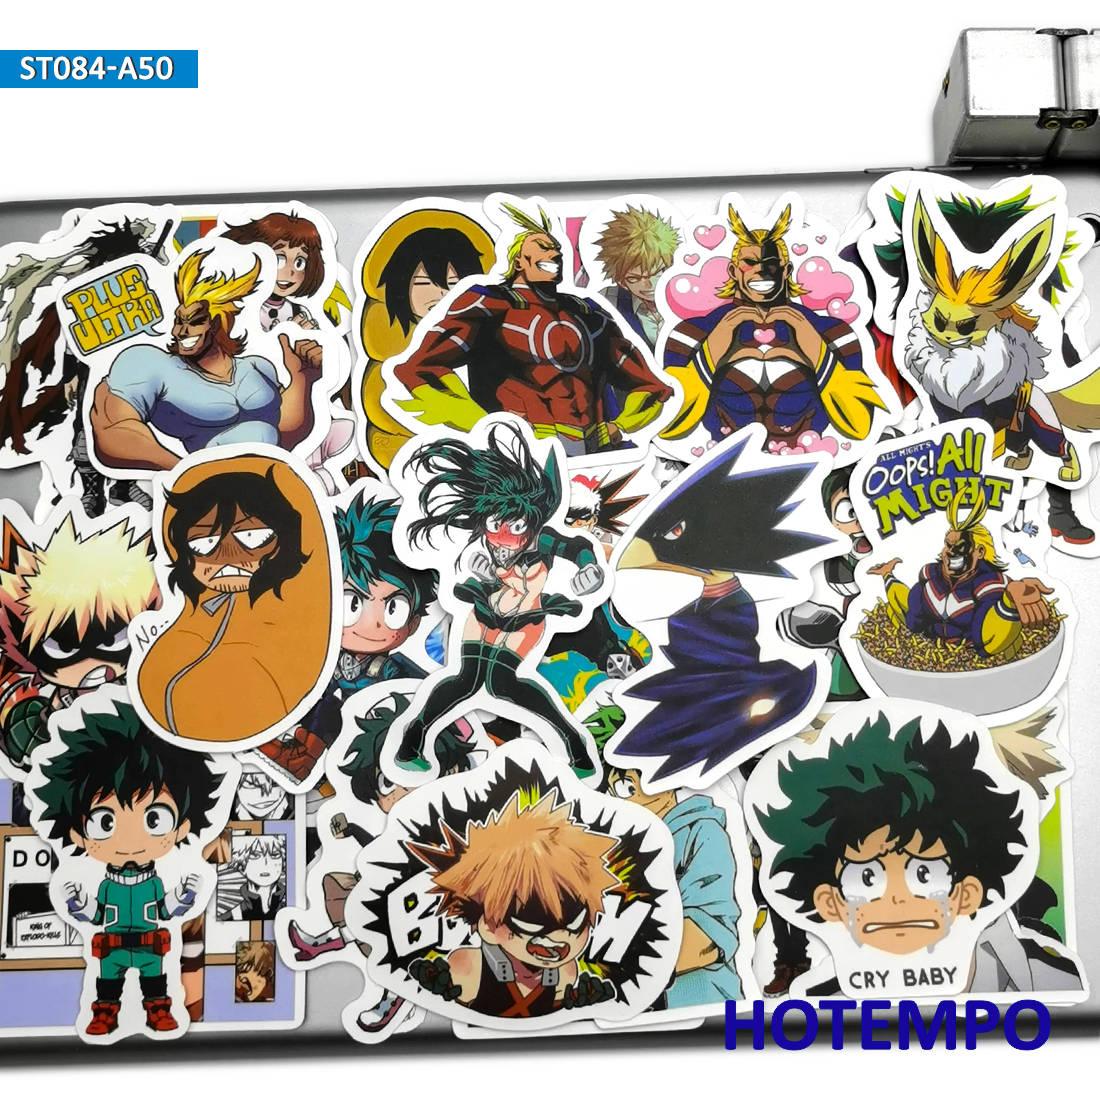 50pcs Anime Midoriya Izuku All Might My Hero Academia Stickers Toys For Mobile Phone Laptop Luggage Skateboard Cartoon Stickers